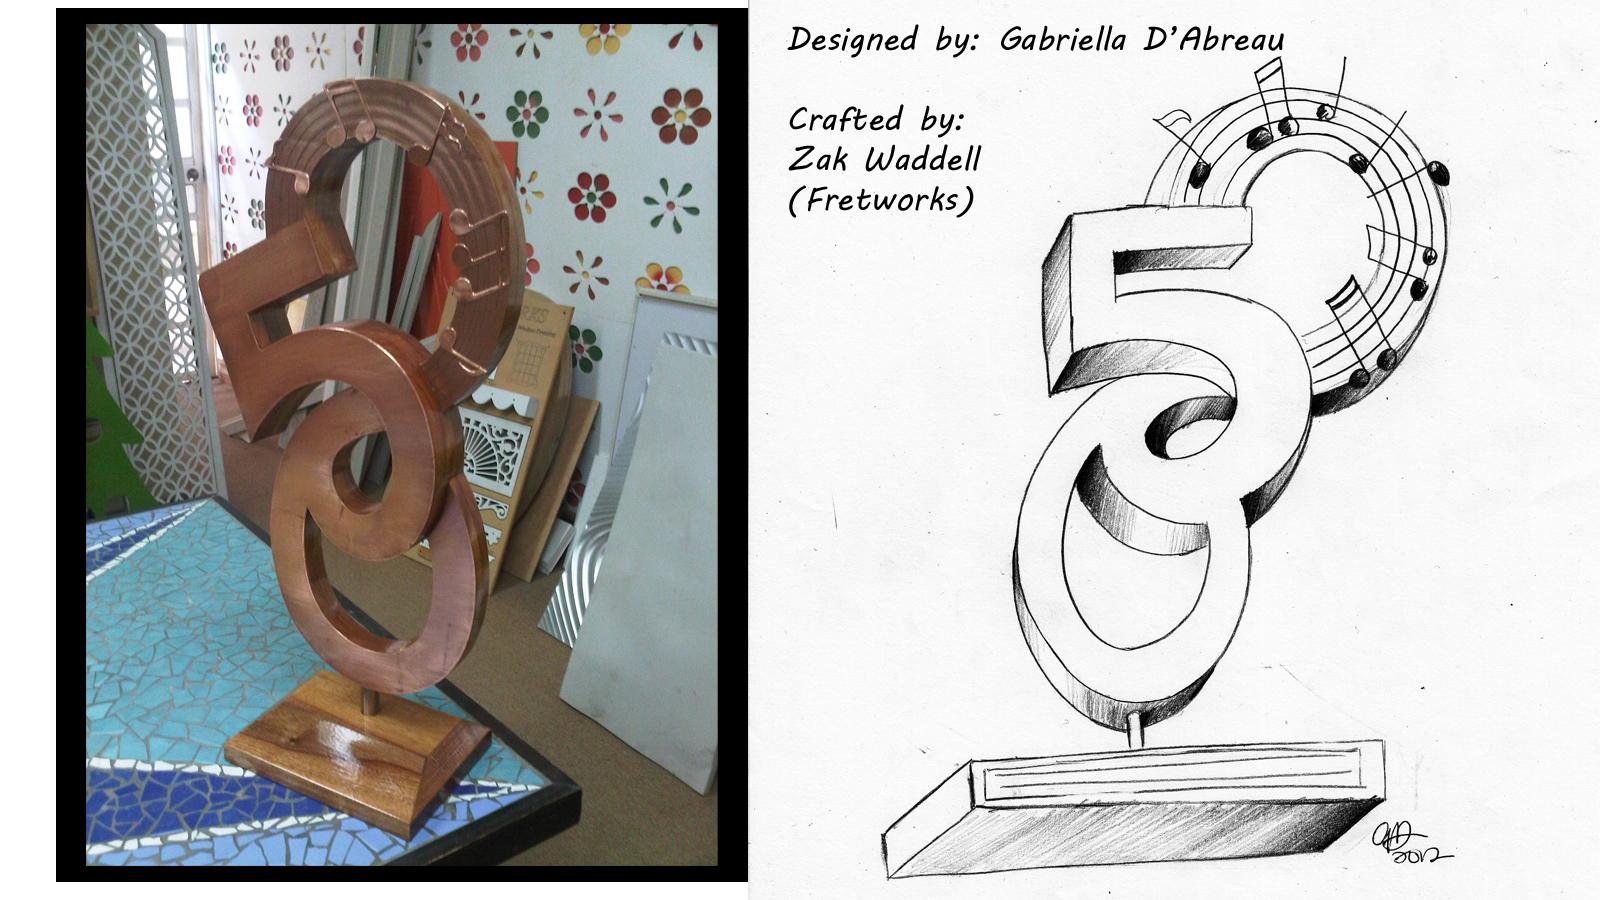 Design for Lord Brynner Trophy